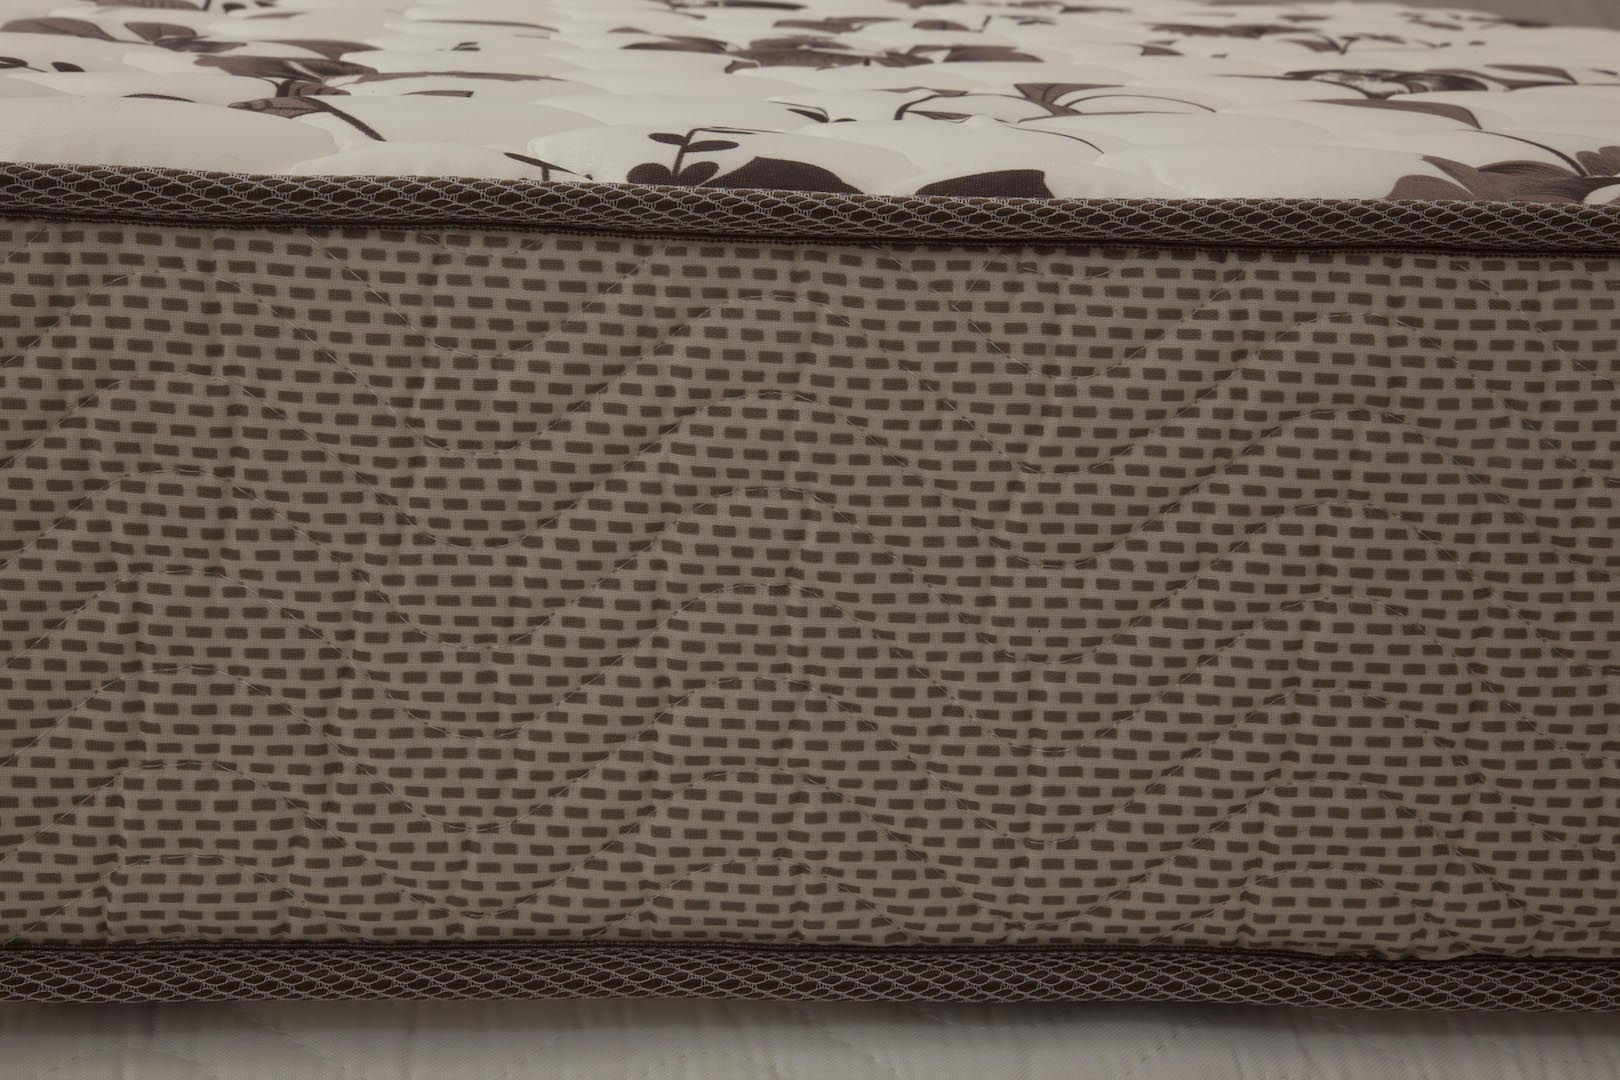 Colchao Physical Mega Resistente Solteiro 78 cm (LARG) Branco - 52717